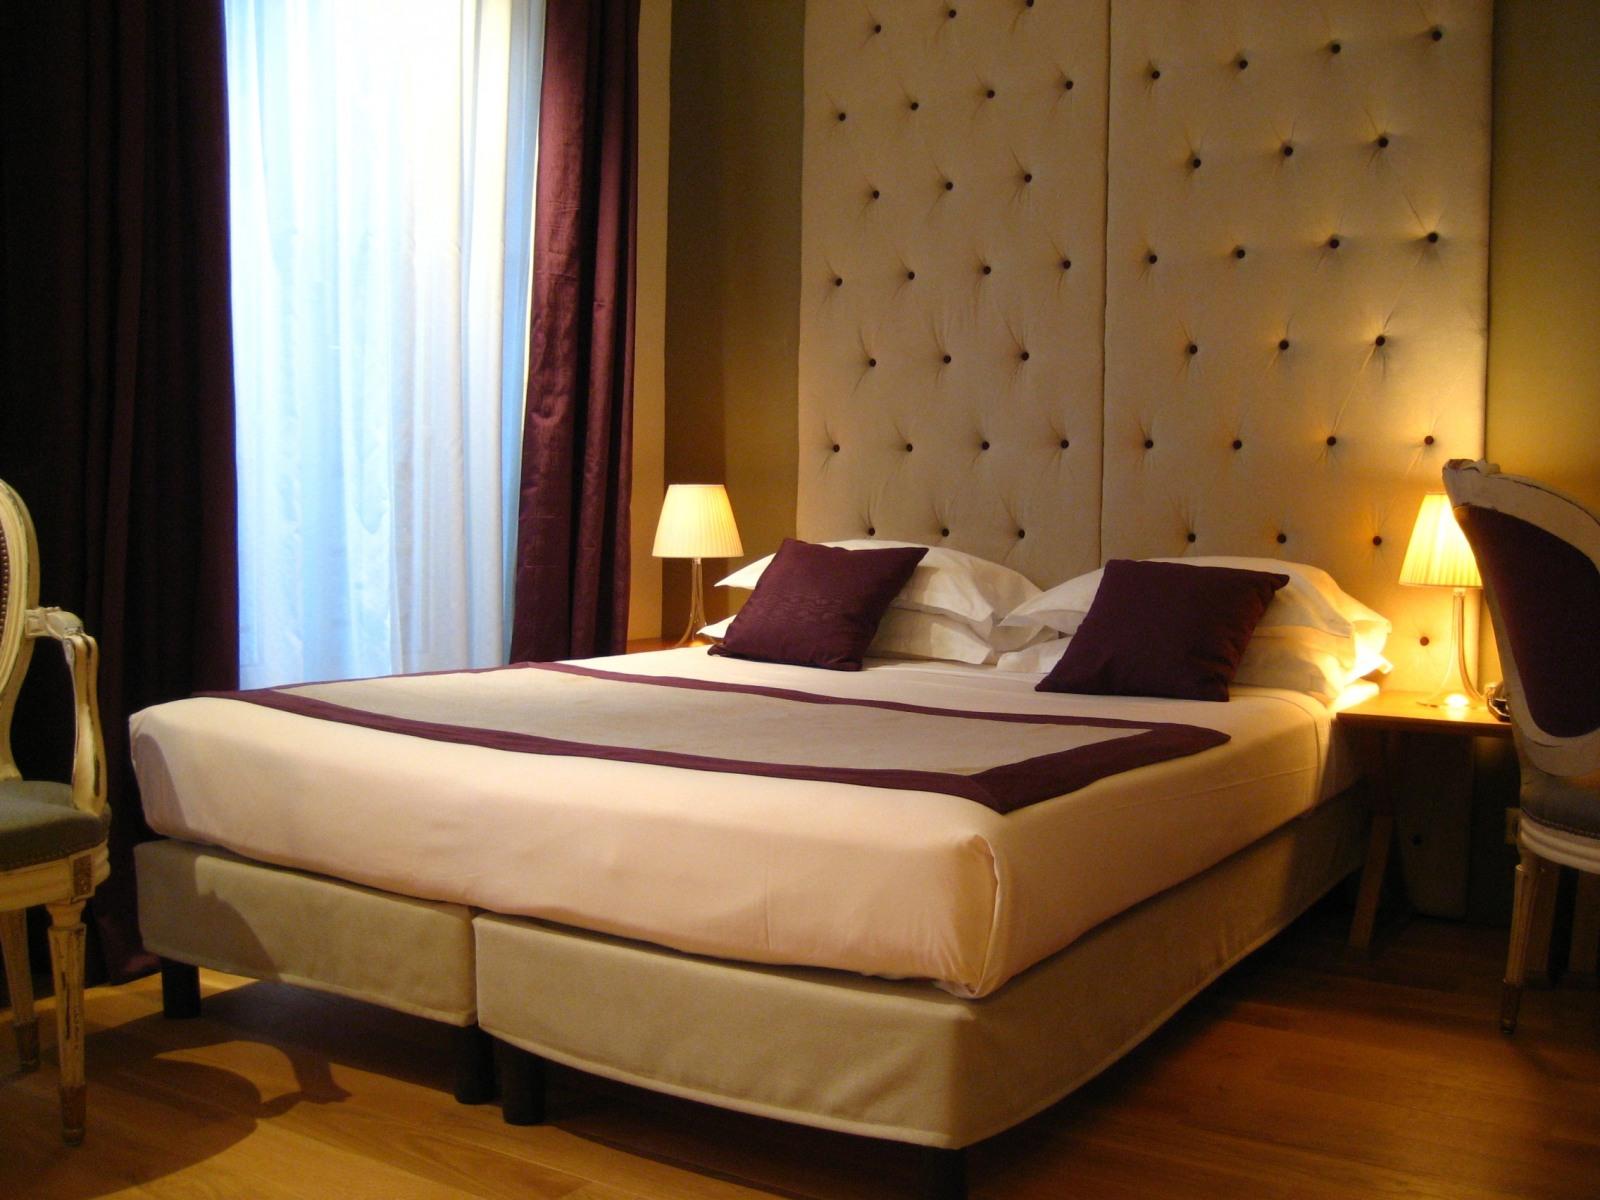 Hotel windsor op ra hotel grands boulevards paris for Hotel paris chambre 4 personnes